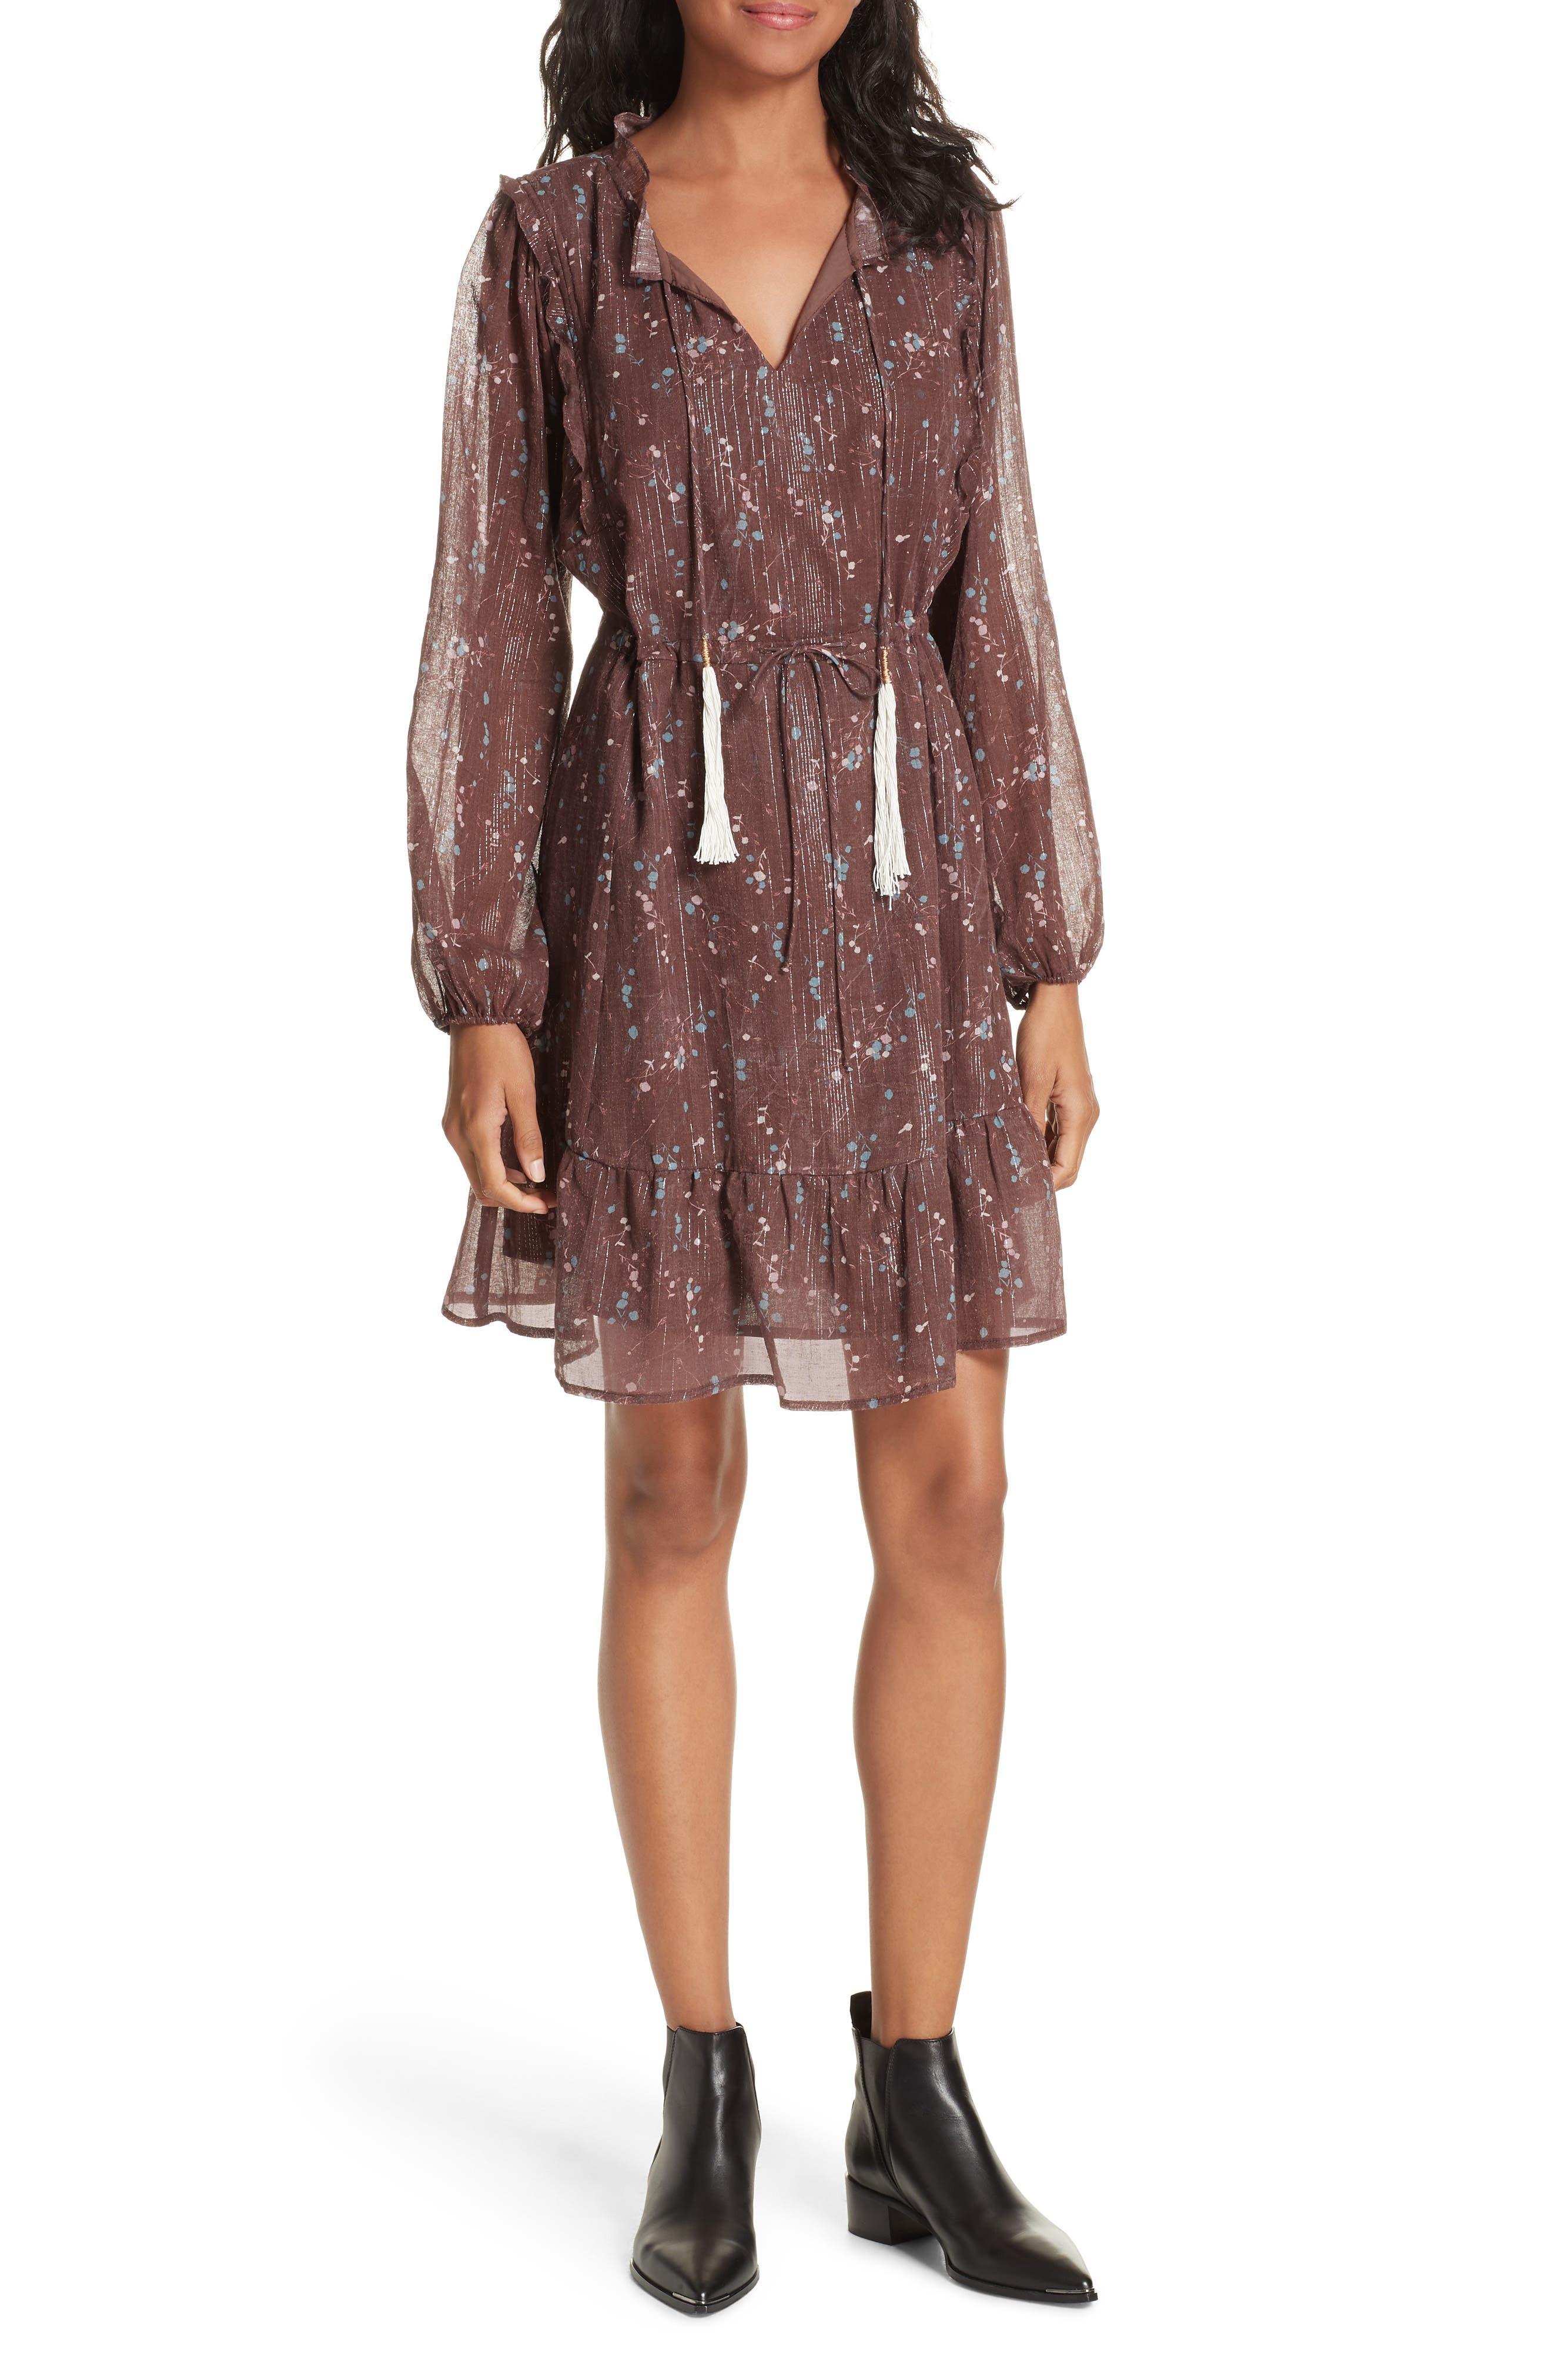 Ruffled Drawstring Waist Dress,                             Alternate thumbnail 6, color,                             BROWN PLUM BLOSSOM